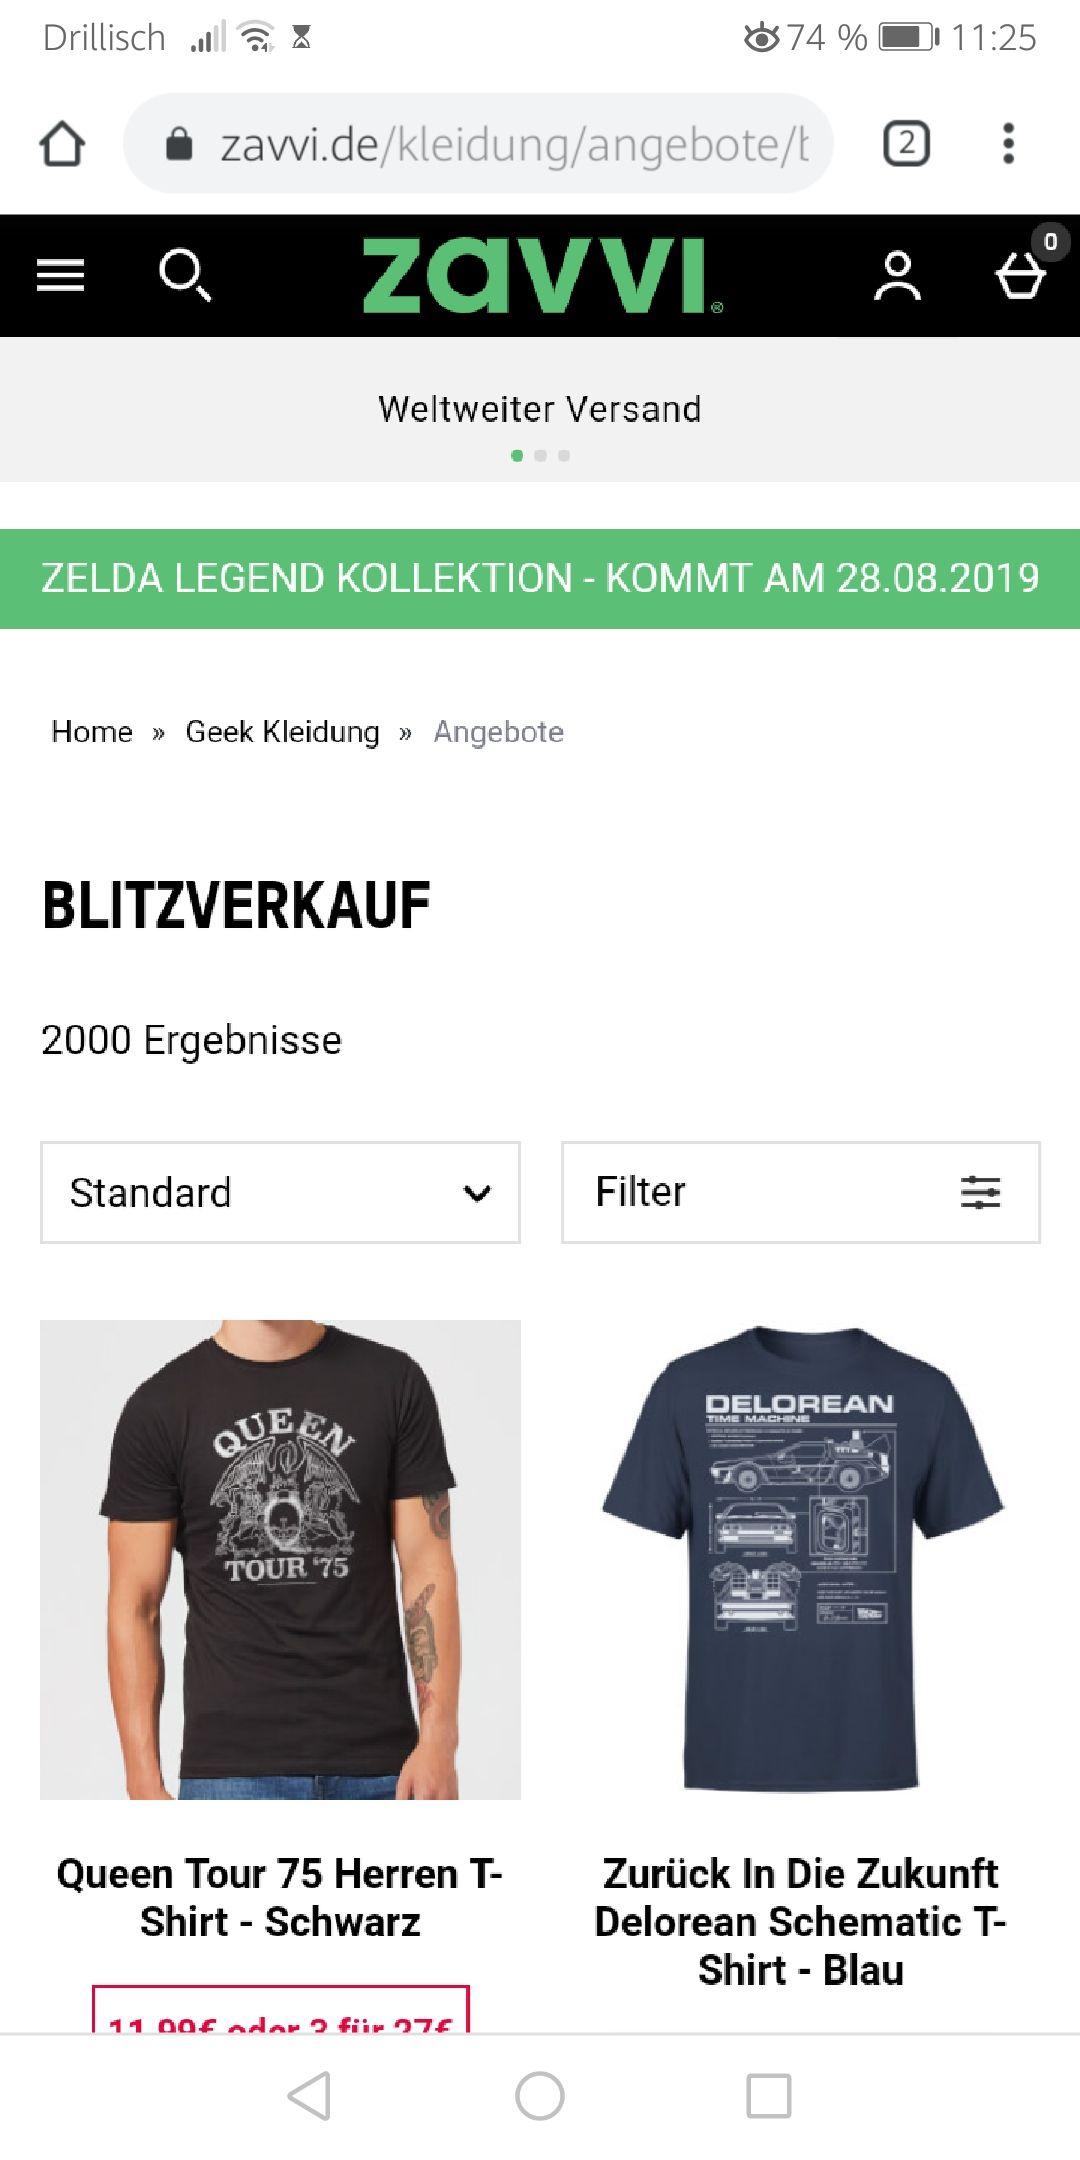 Zavvi.de 3 Shirts für 27,00 Euro